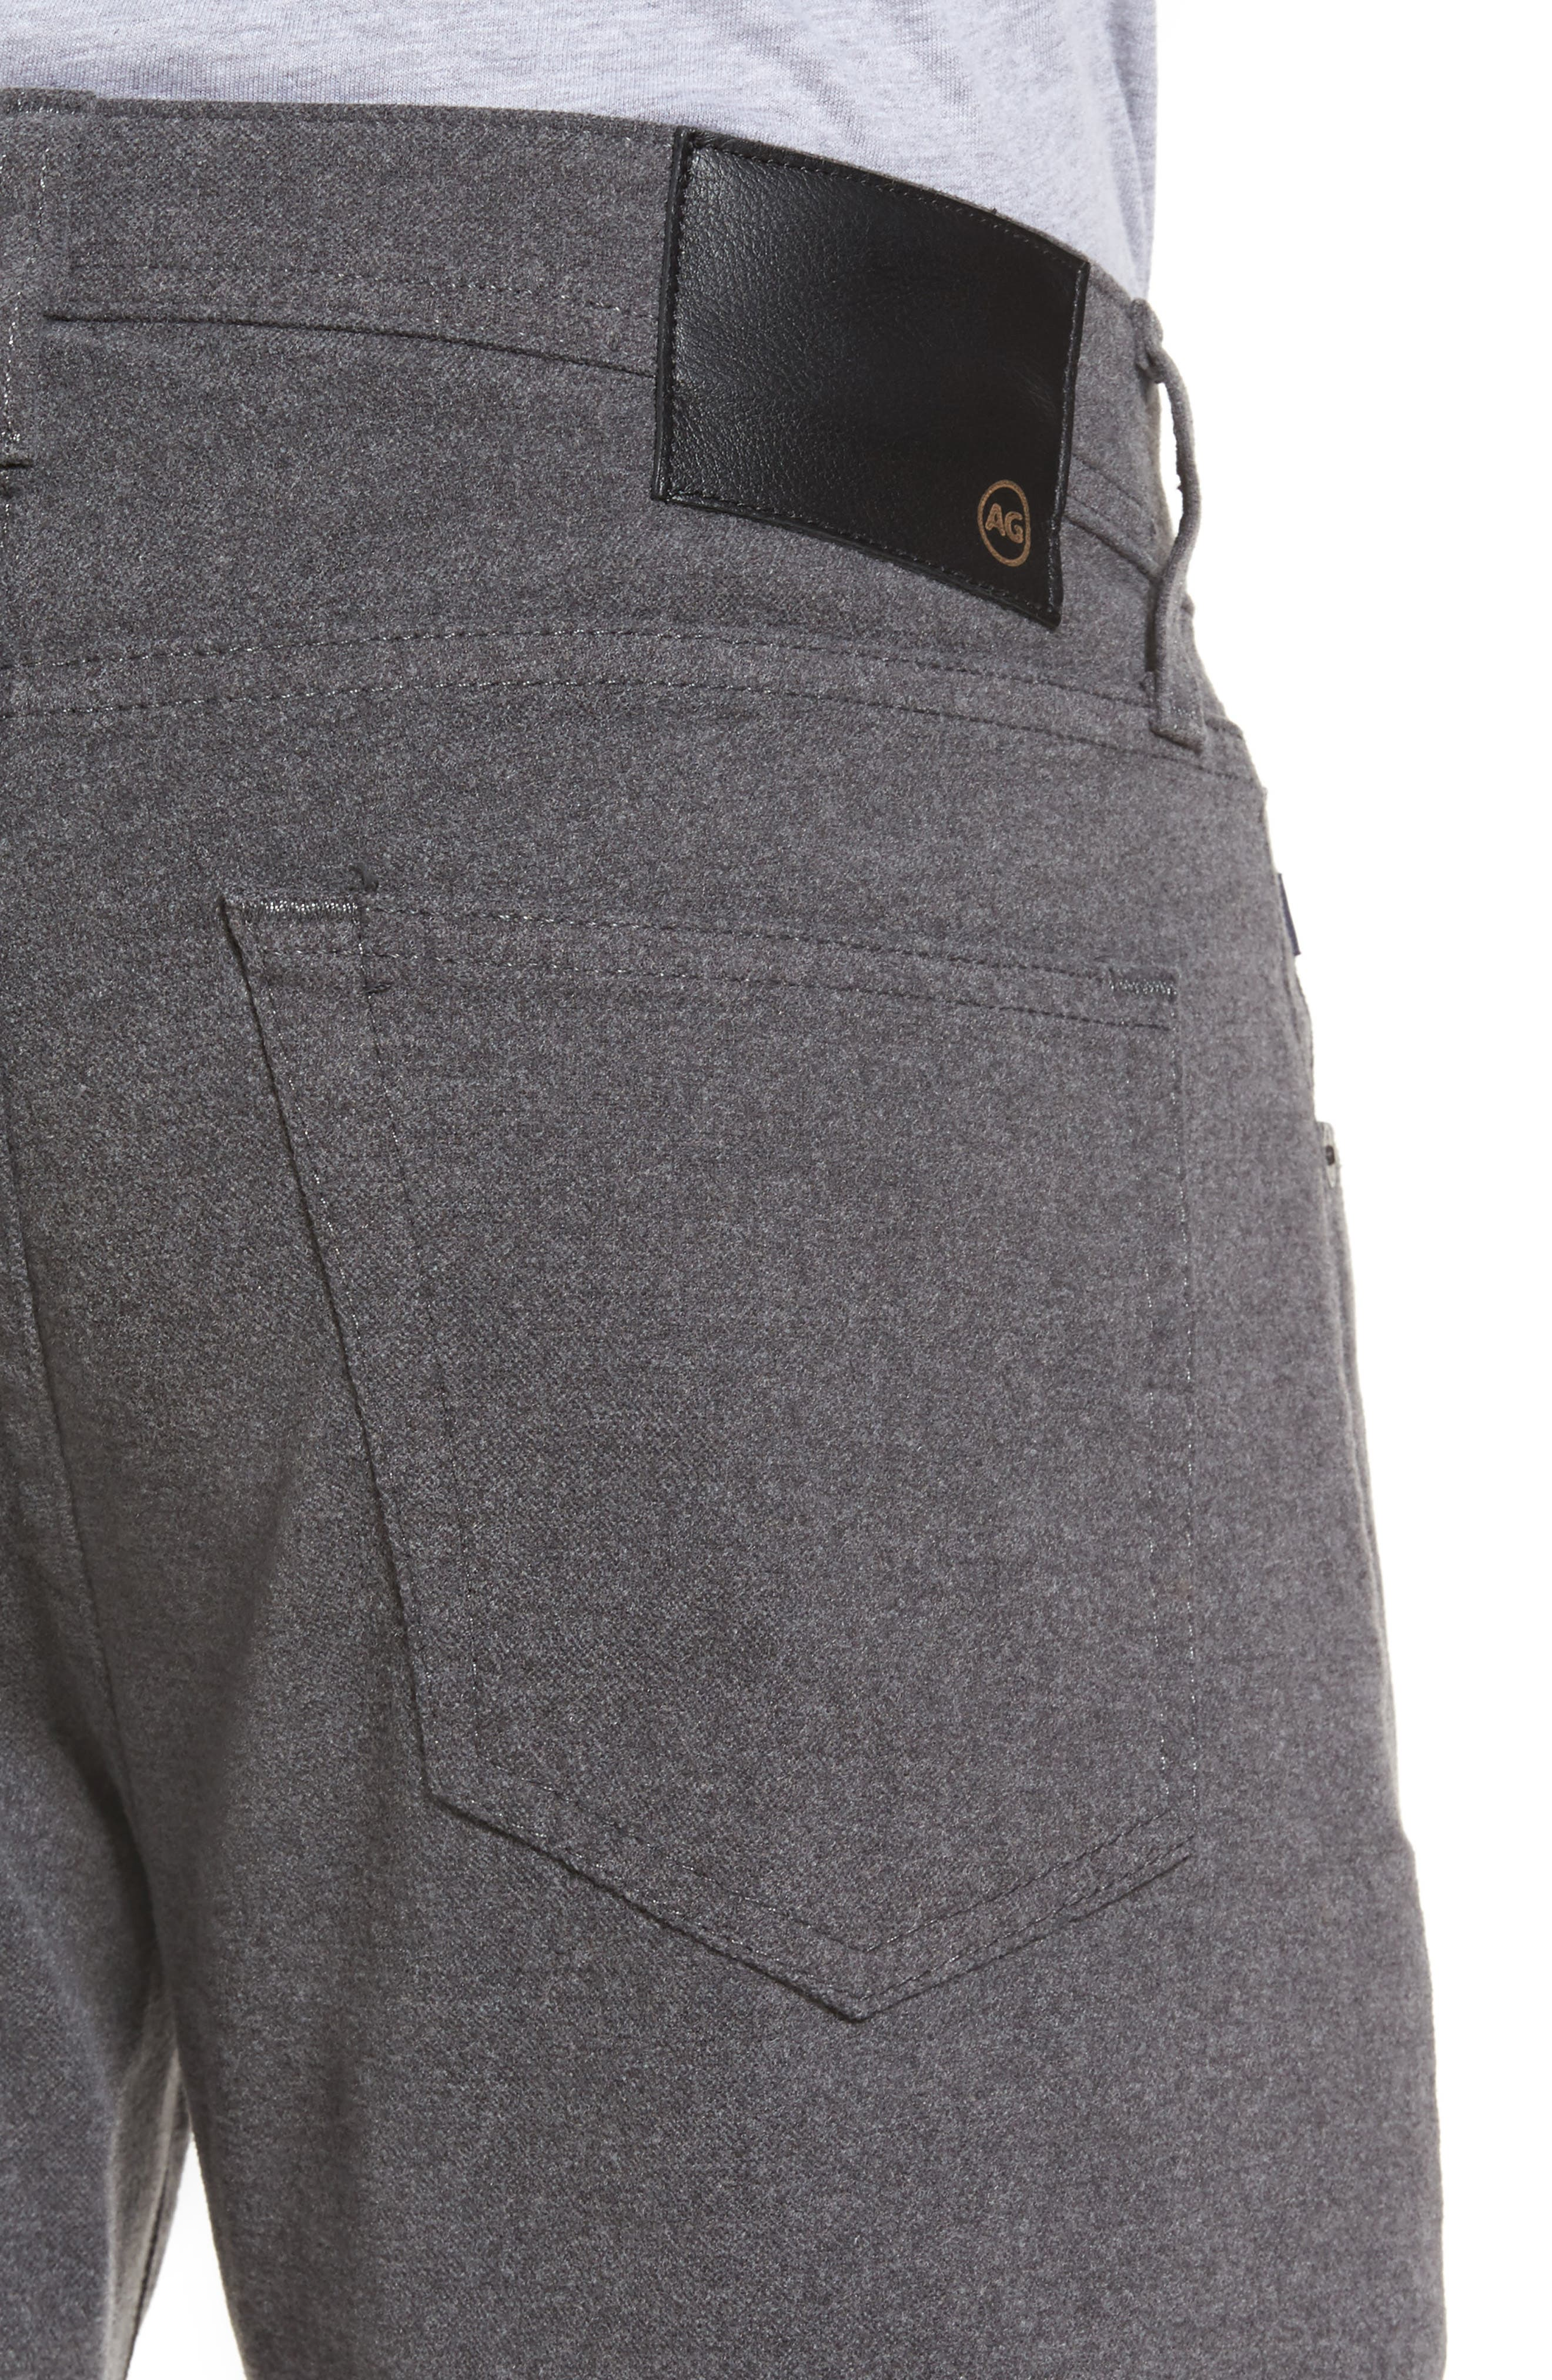 Tellis Slim Fit Five-Pocket Pants,                             Alternate thumbnail 4, color,                             Dark Ridge